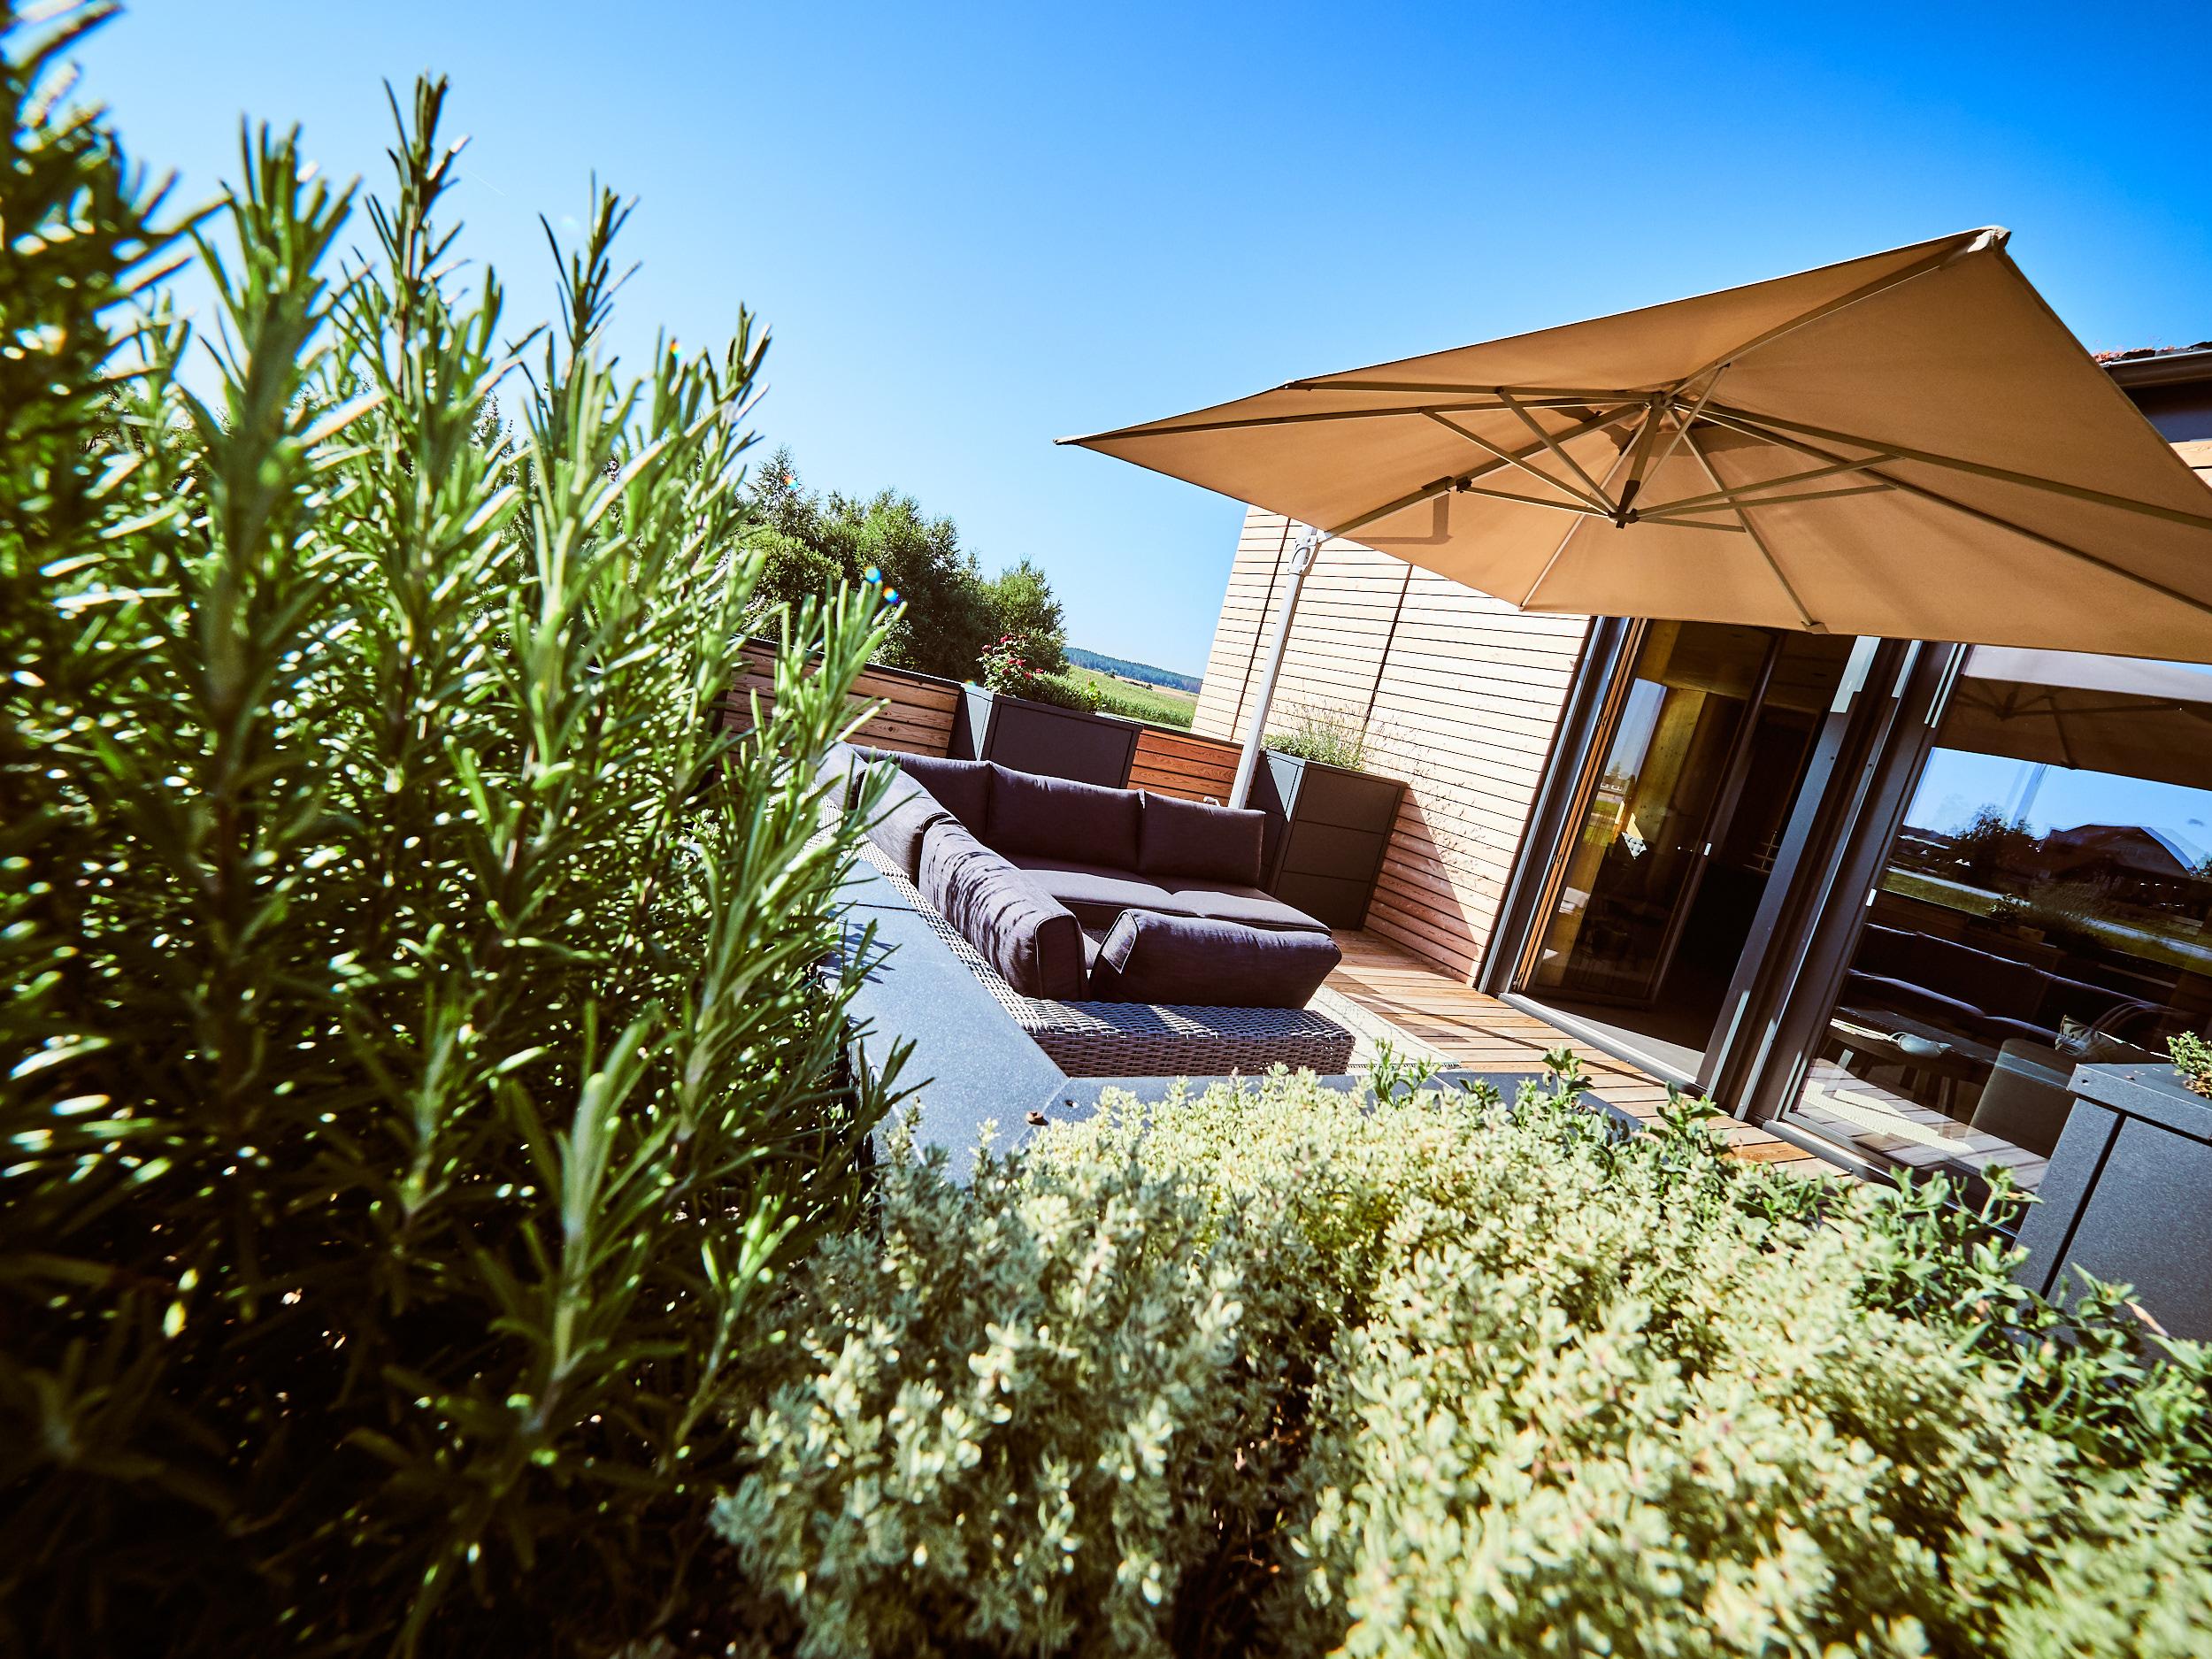 ZiKK 2.0 Musterhaus Vitis - Ambiente der Terrasse